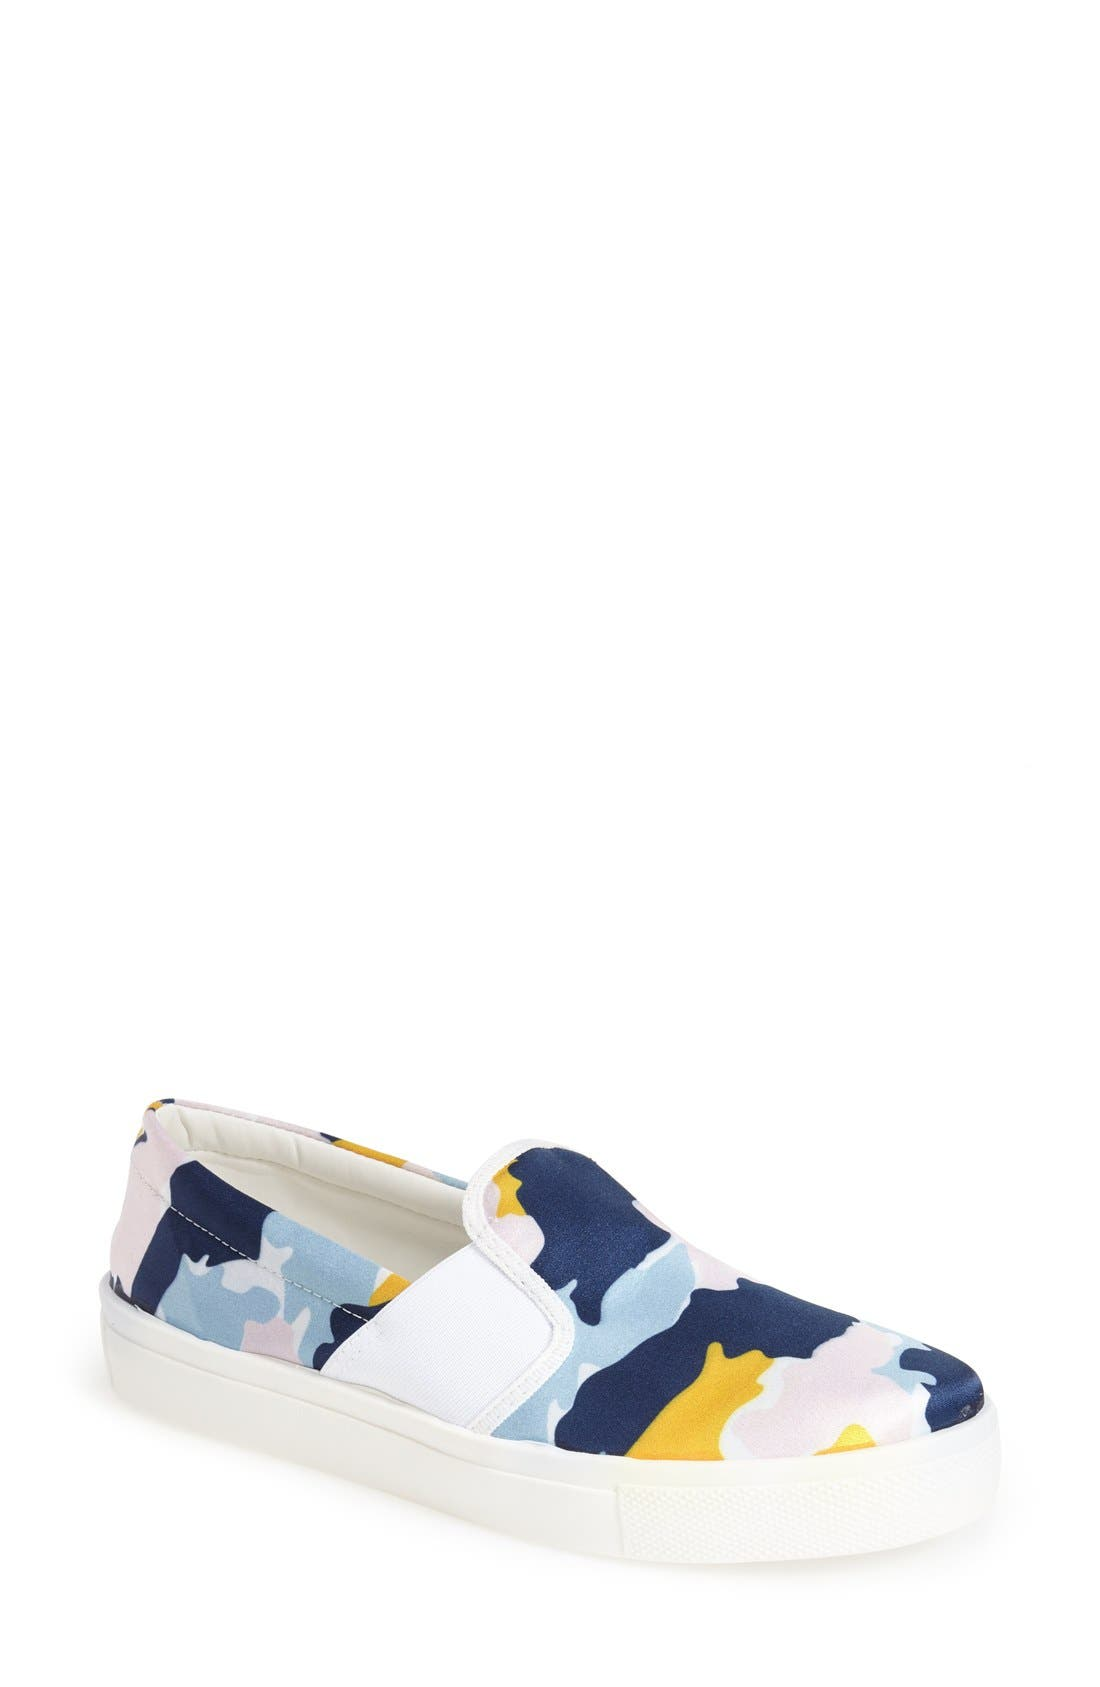 Main Image - Topshop 'Tiga - Smudge Print' Slip-On Skater Shoe (Women)